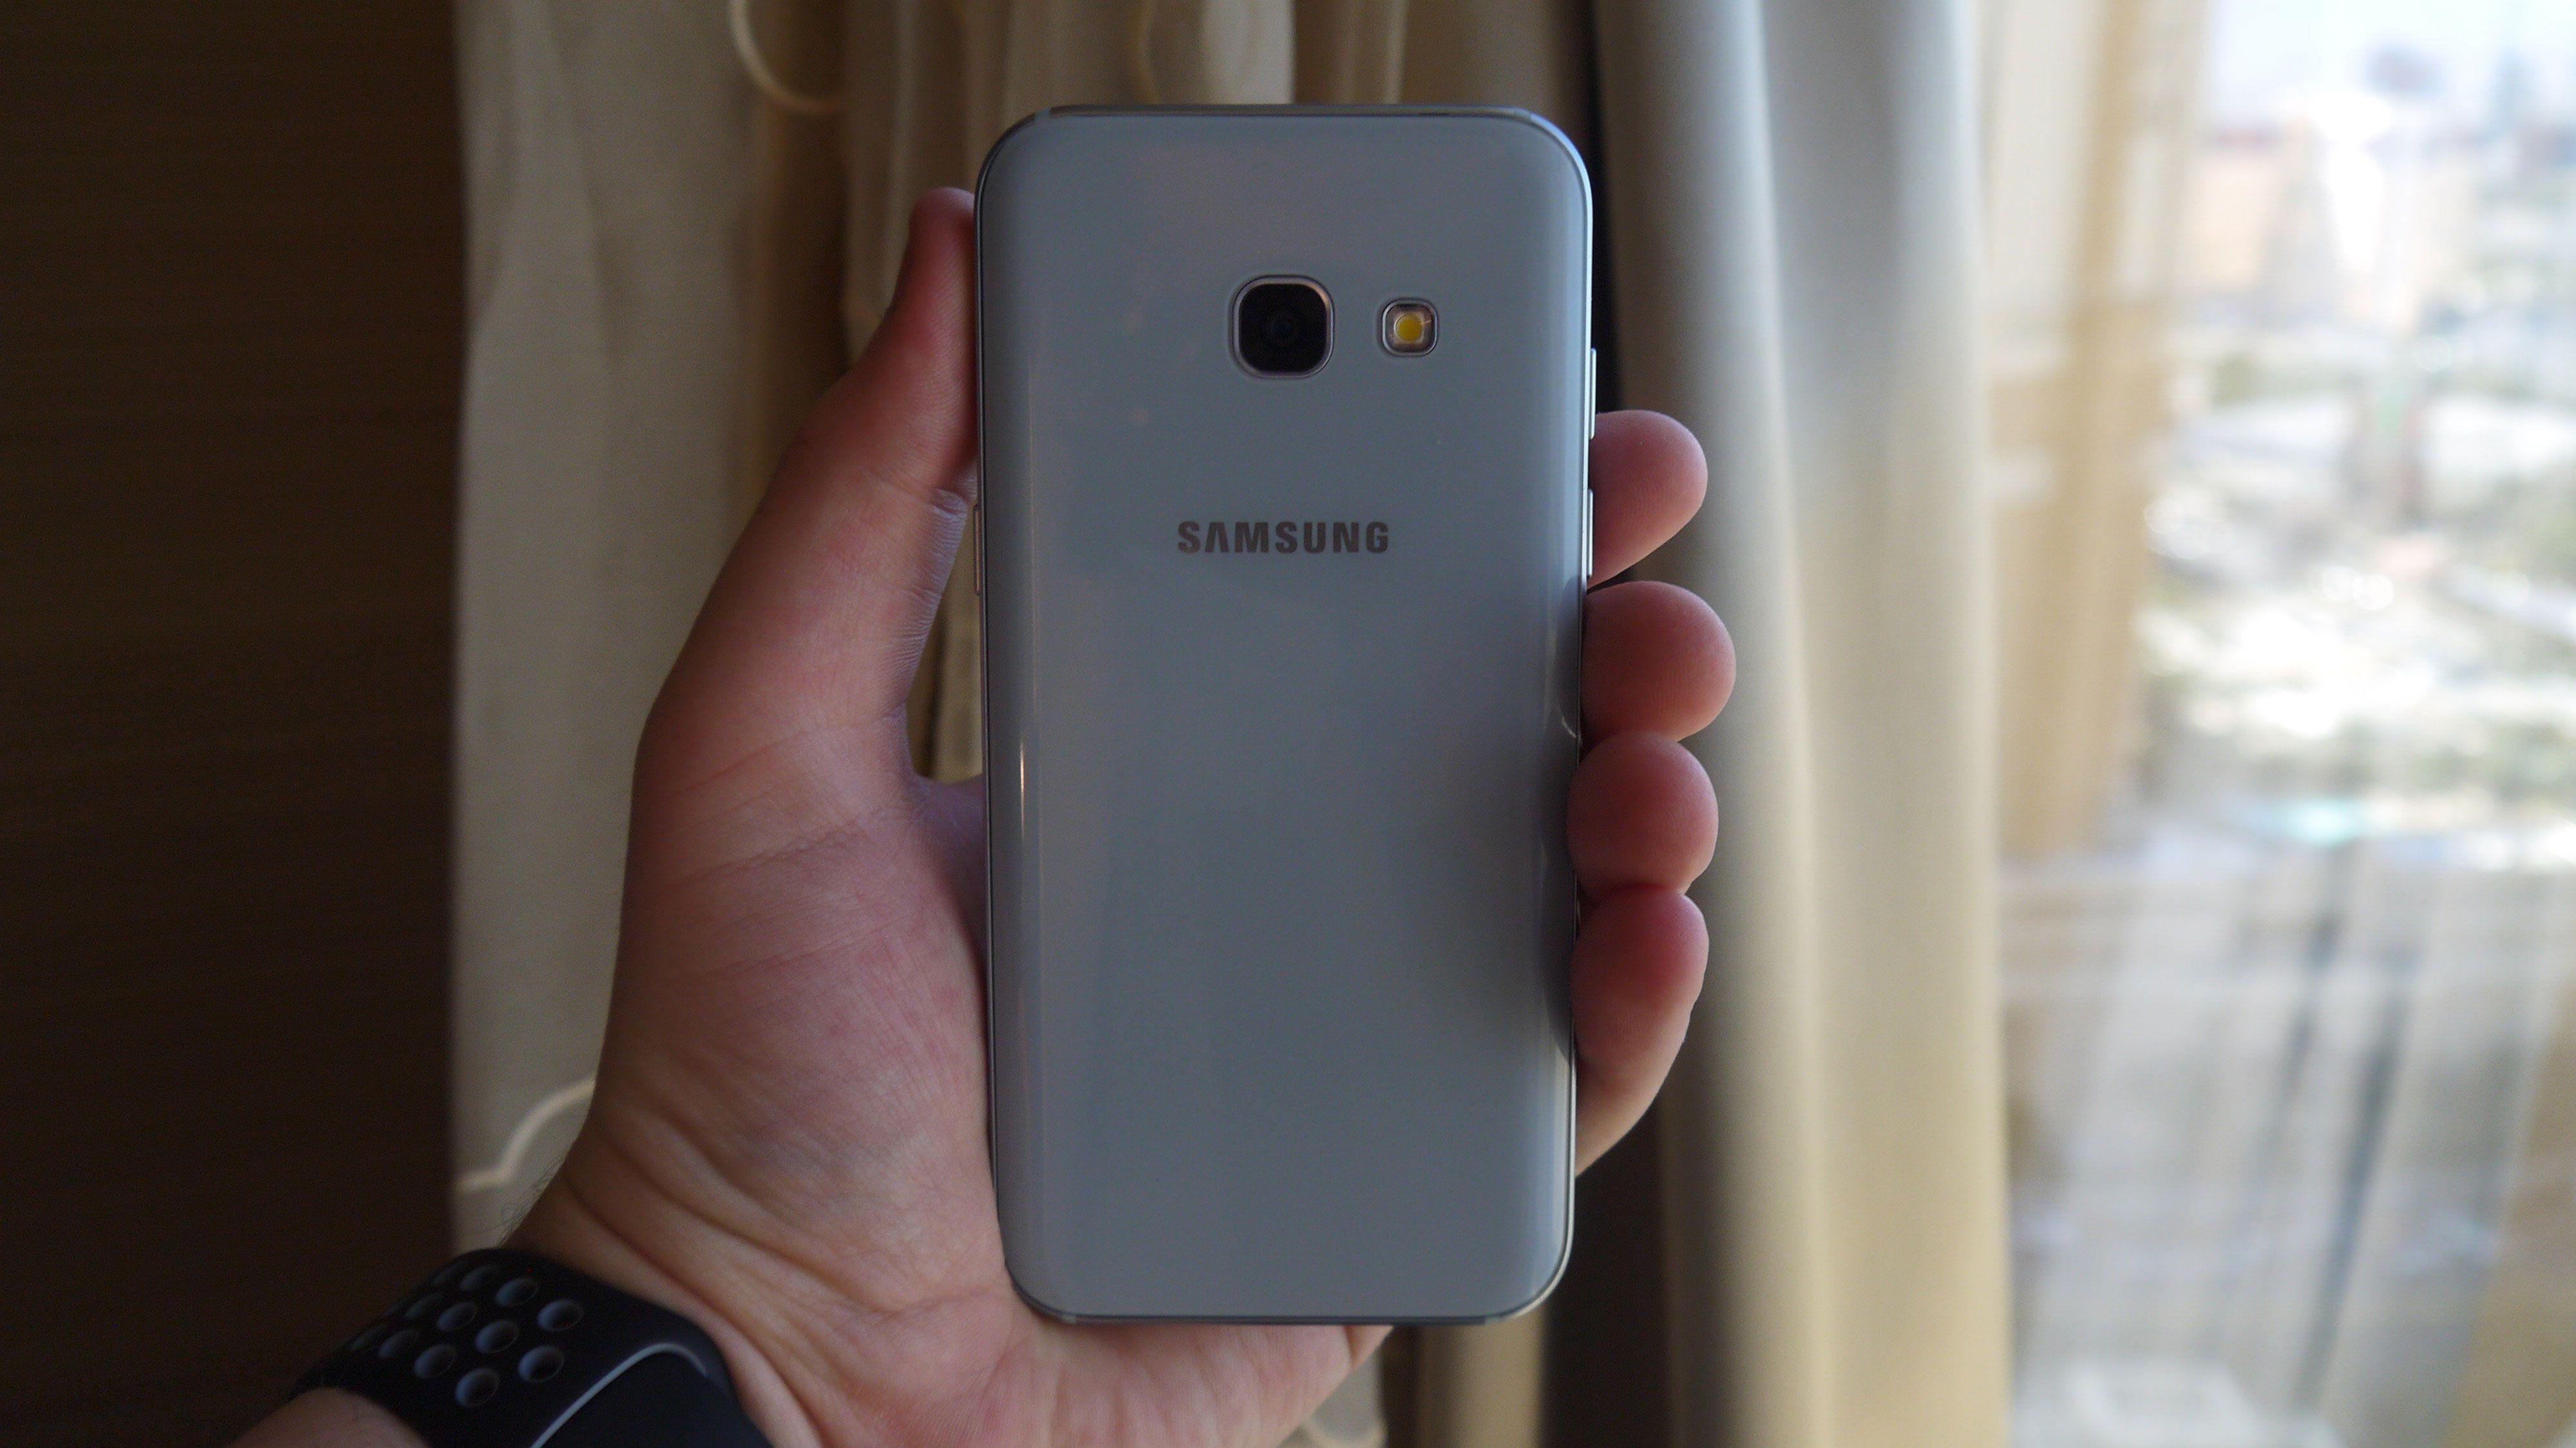 Samsung Galaxy A3 2017 Samsung has given its midrange